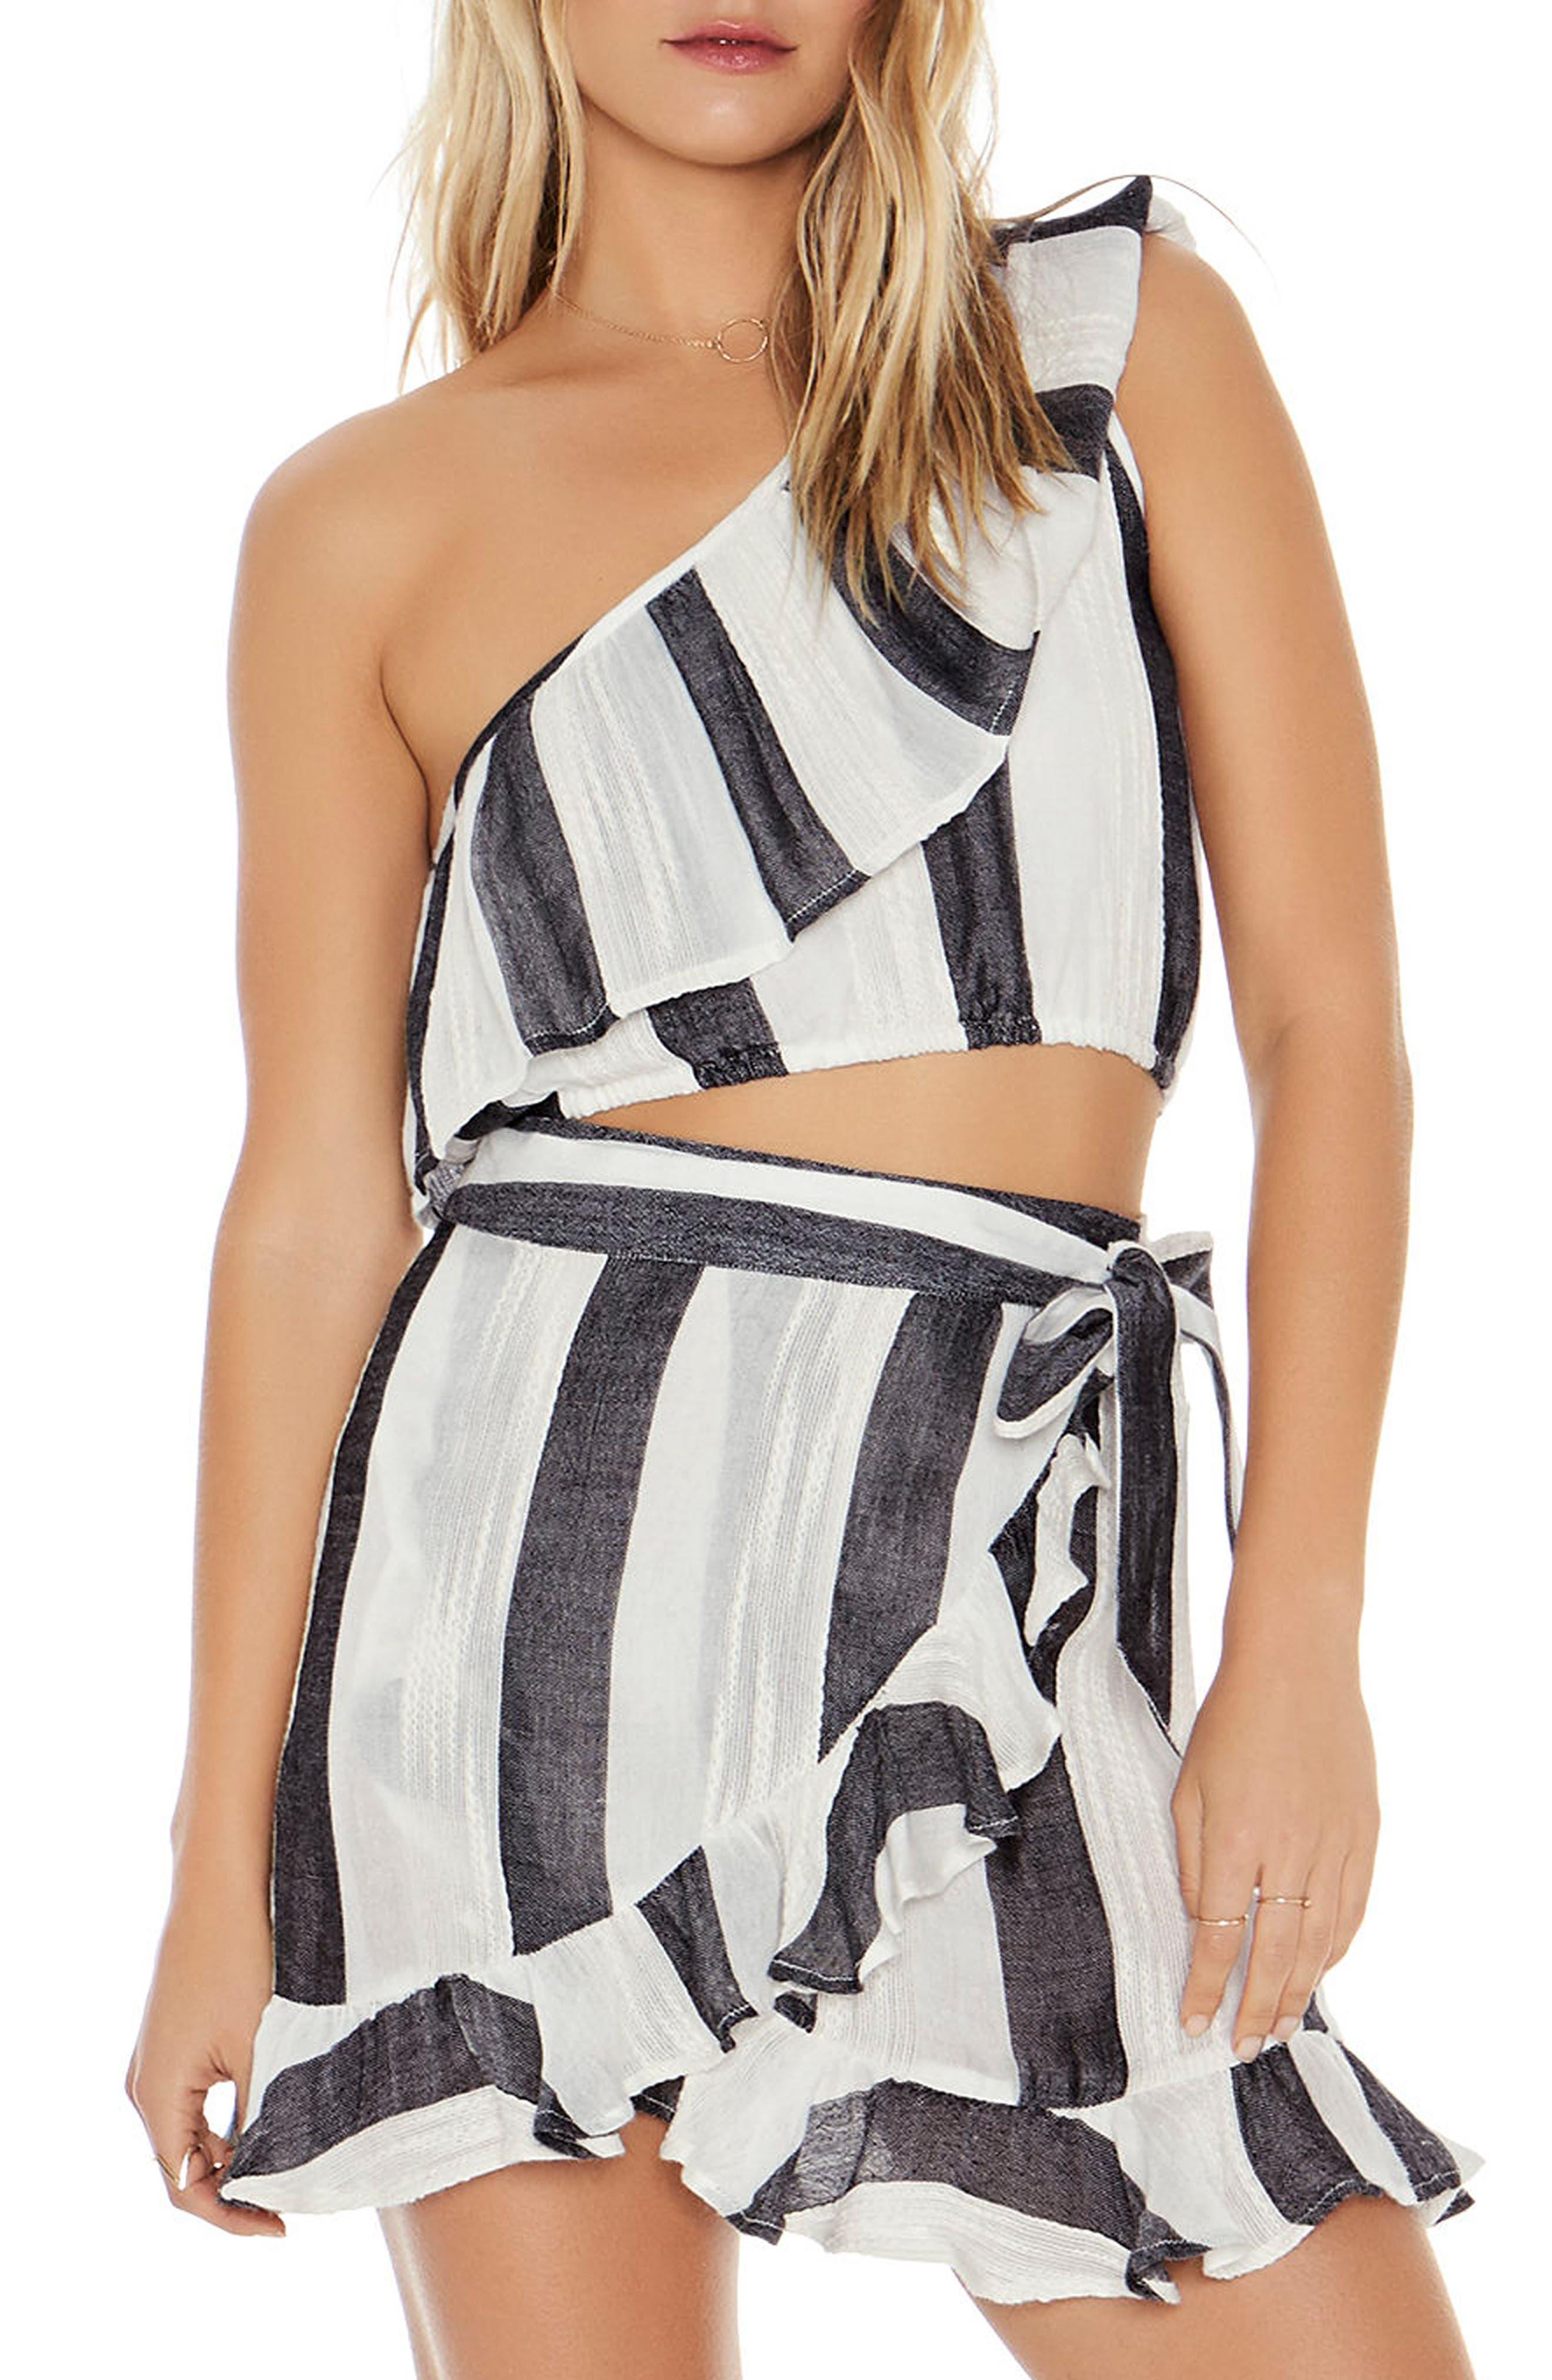 Alicia One-Shoulder Cover-Up Top,                         Main,                         color, Beach Bum Stripe